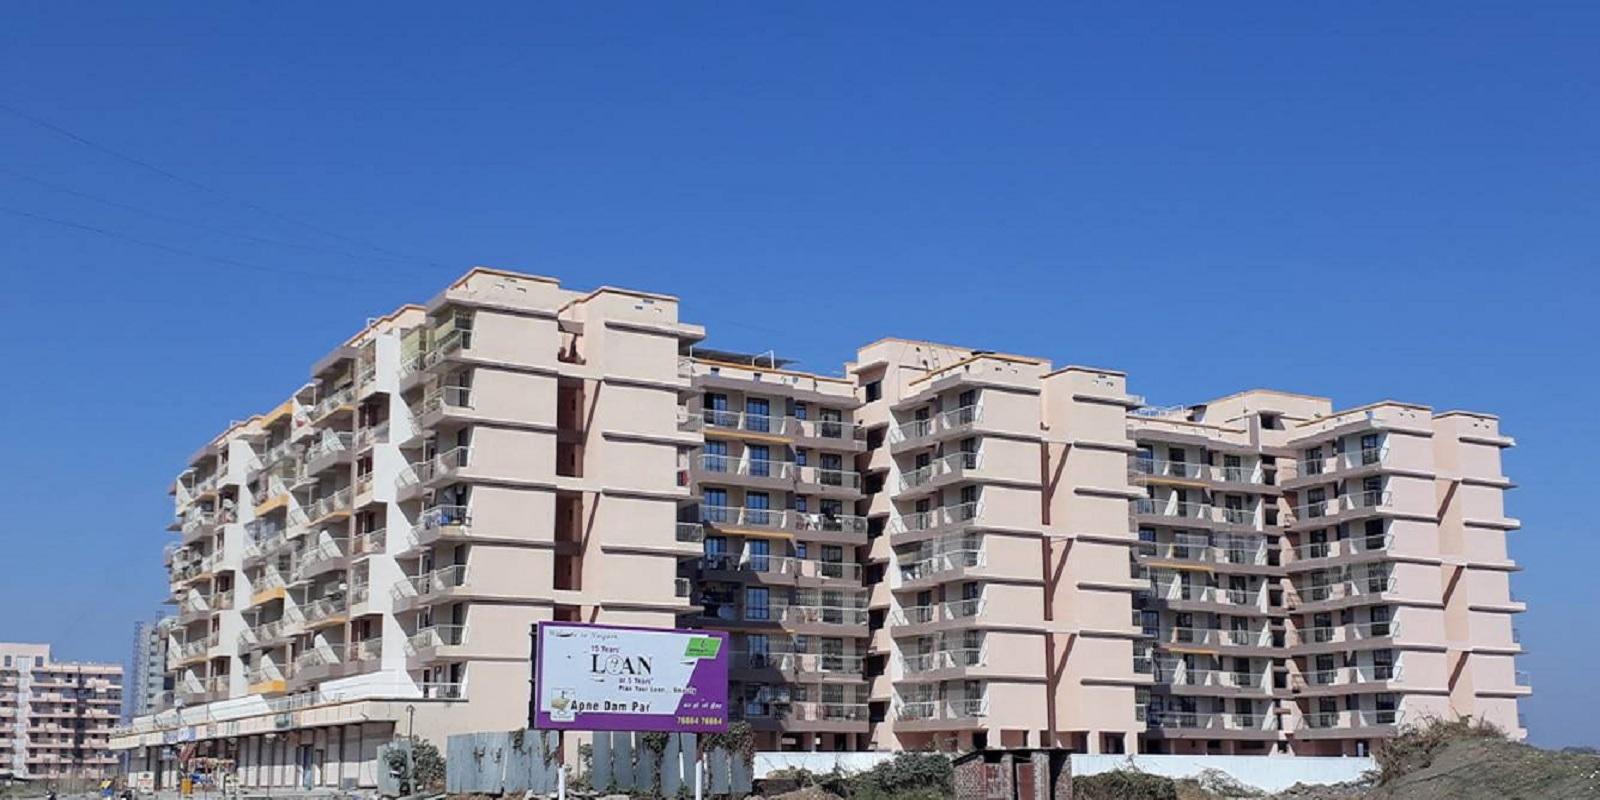 parasnath nagari building no. 2 project project large image1